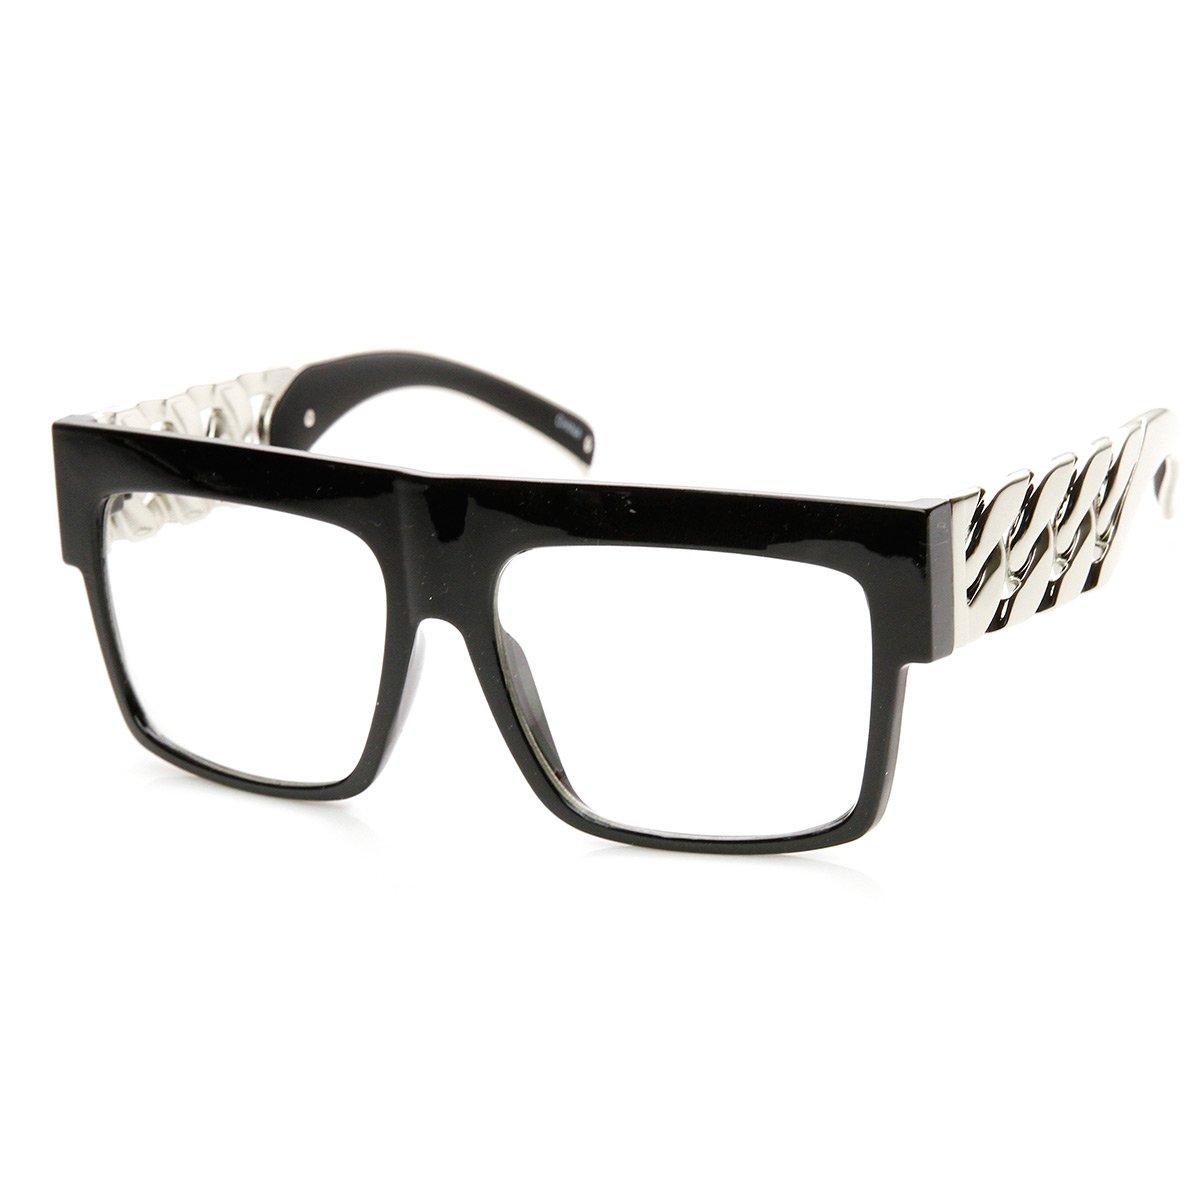 High Fashion Metal Chain Arm Clear Lens Flat Top Aviator Glasses (Black Silver)